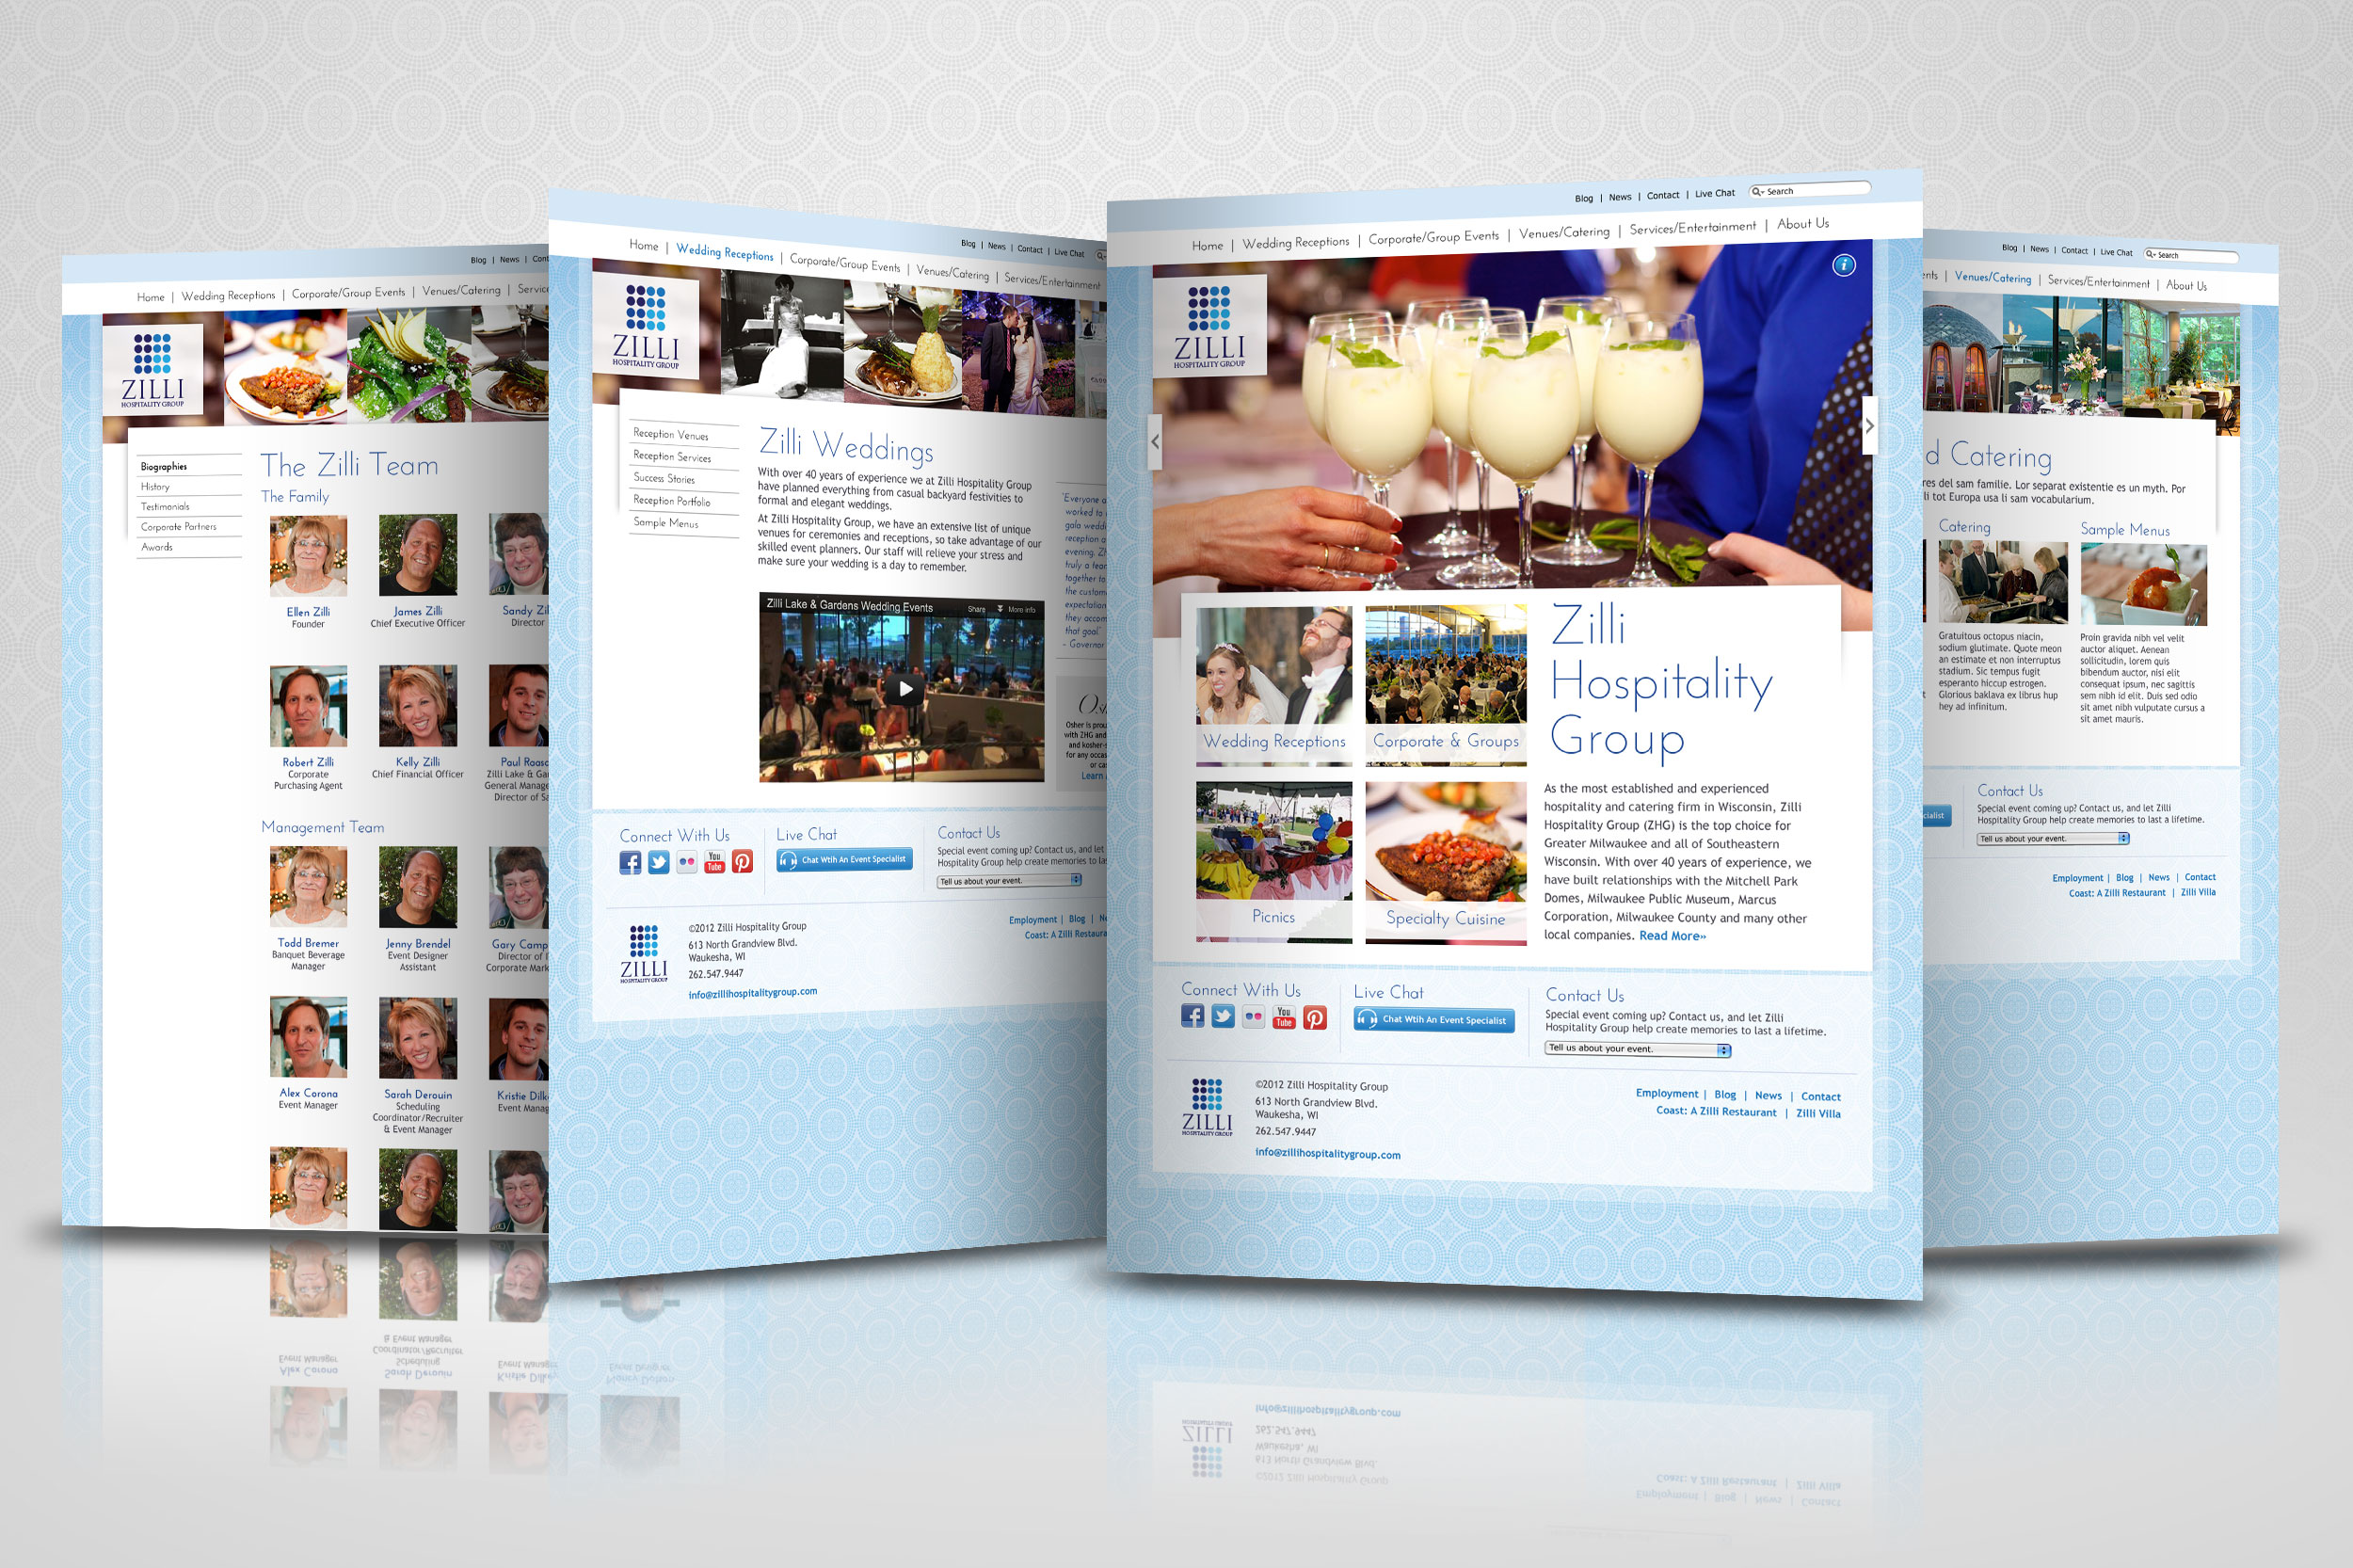 Zilli Hospitality Group Website (2012)